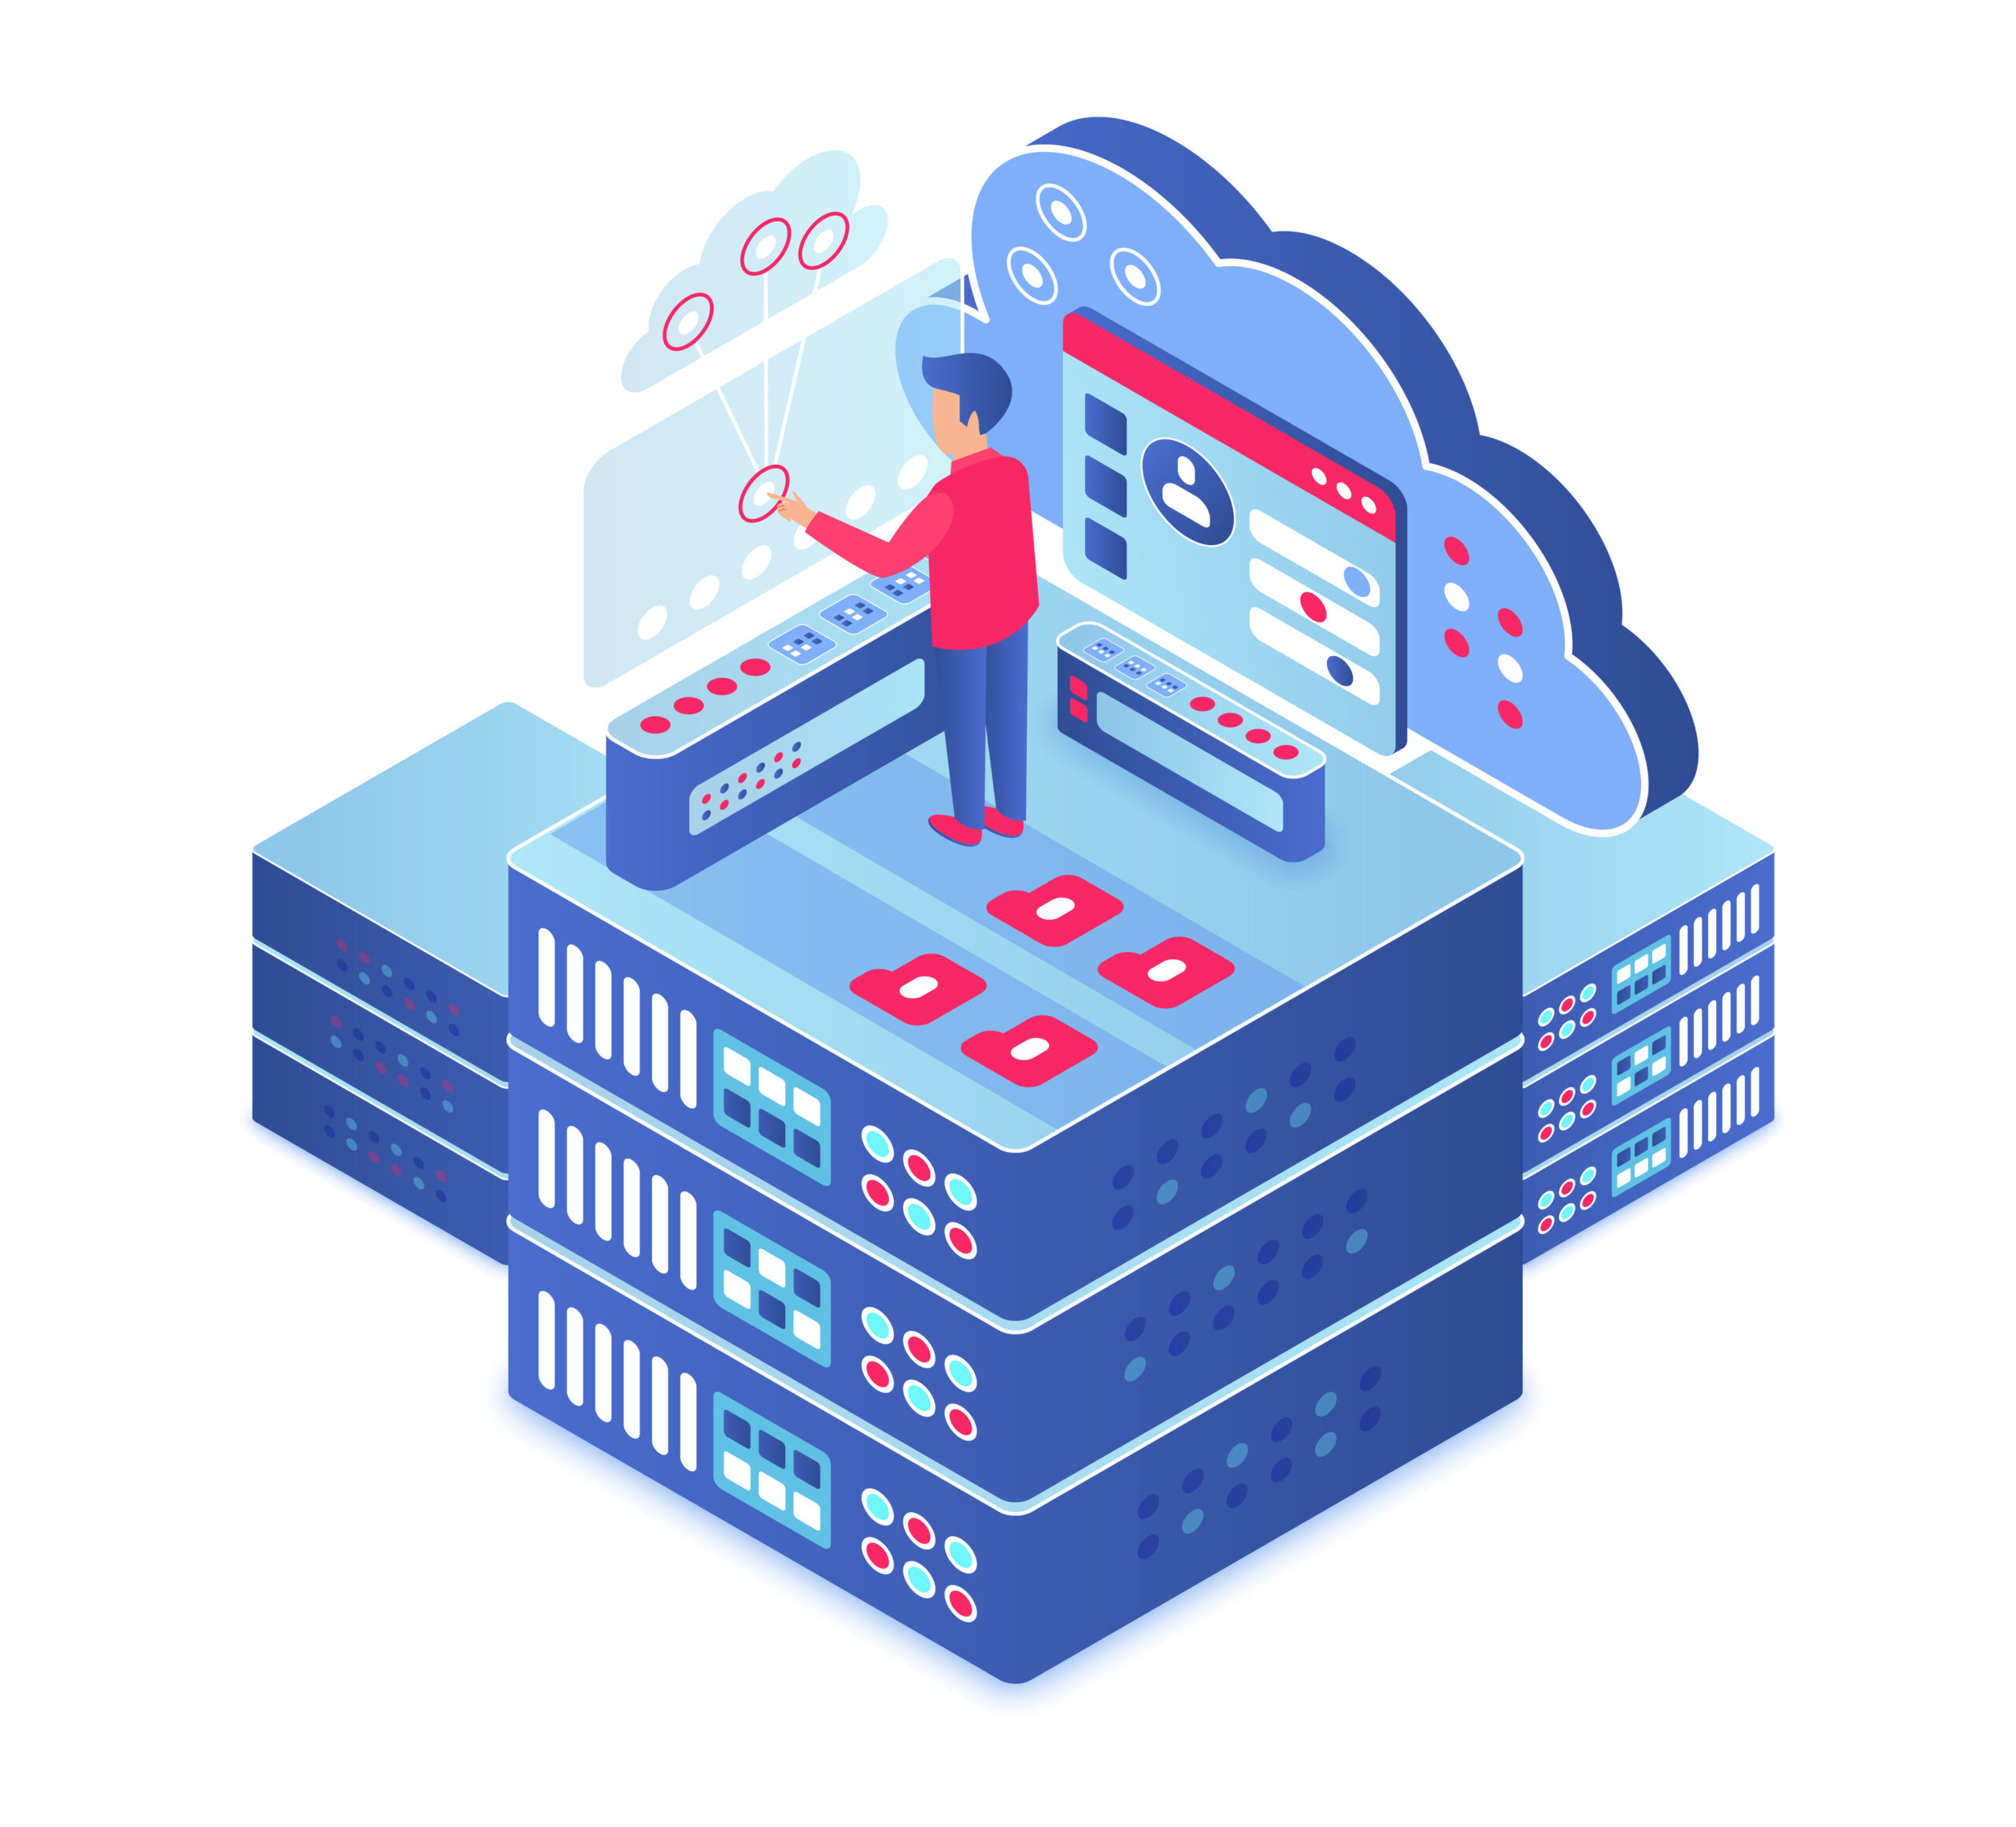 Cloud computing isometric vector illustration. Information storage technology. Server maintenance. Upload and share information service. Digital platform. Database cartoon conceptual design element